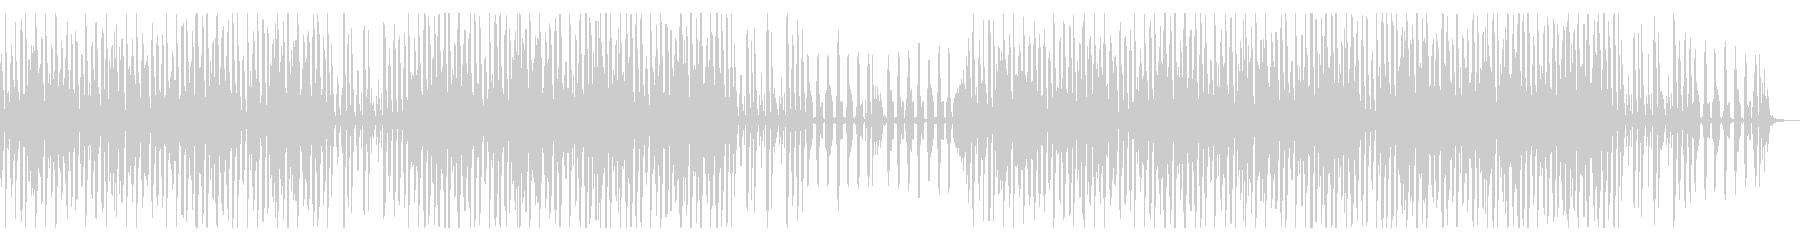 YouTube ピアノ可愛いトークBGMの未再生の波形